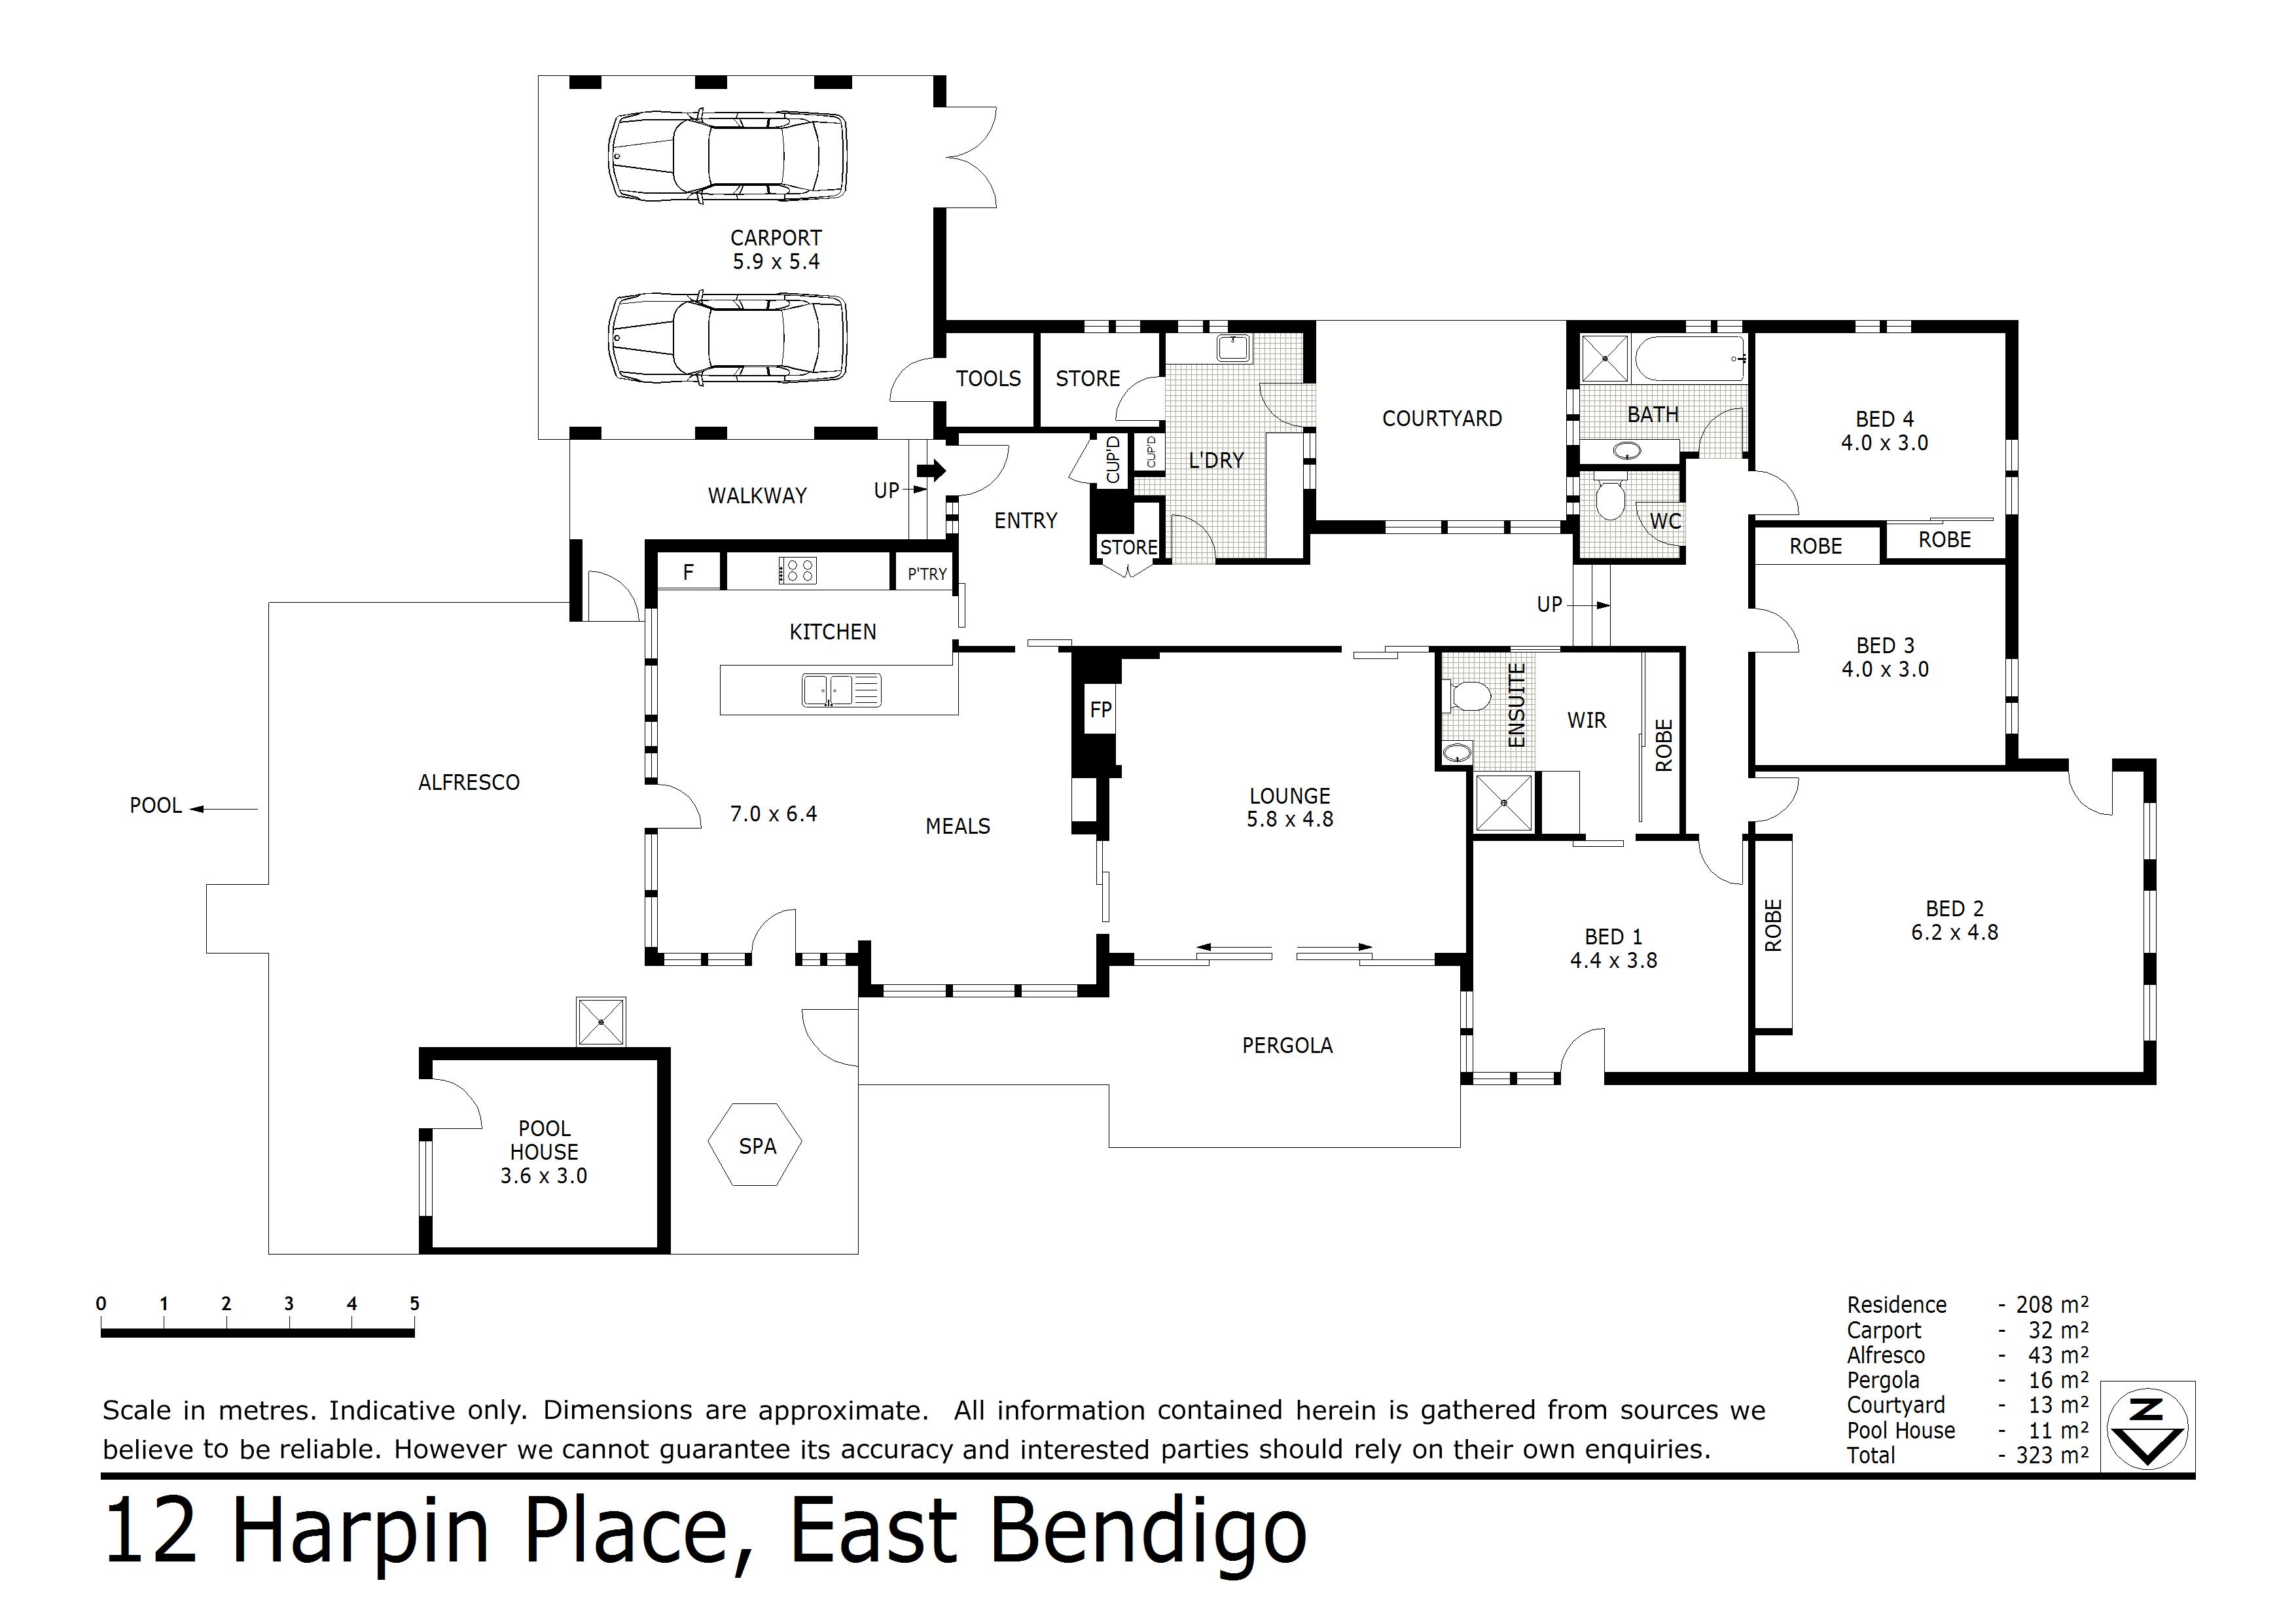 12 Harpin Place, East Bendigo, VIC 3550